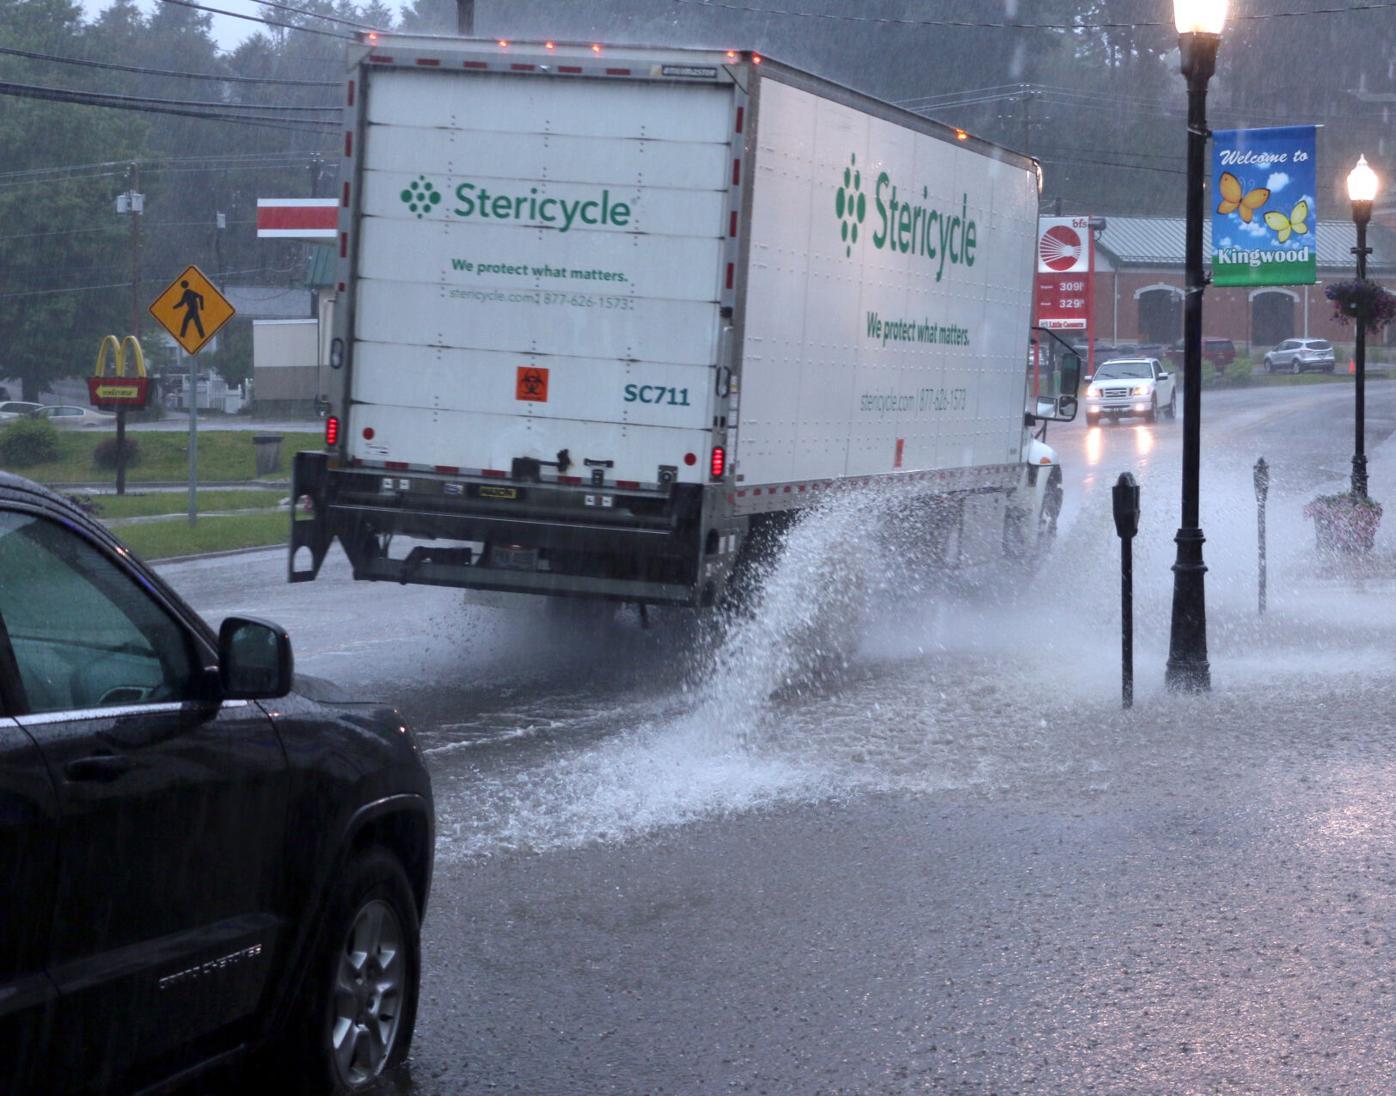 Kingwood sidewalk flooding